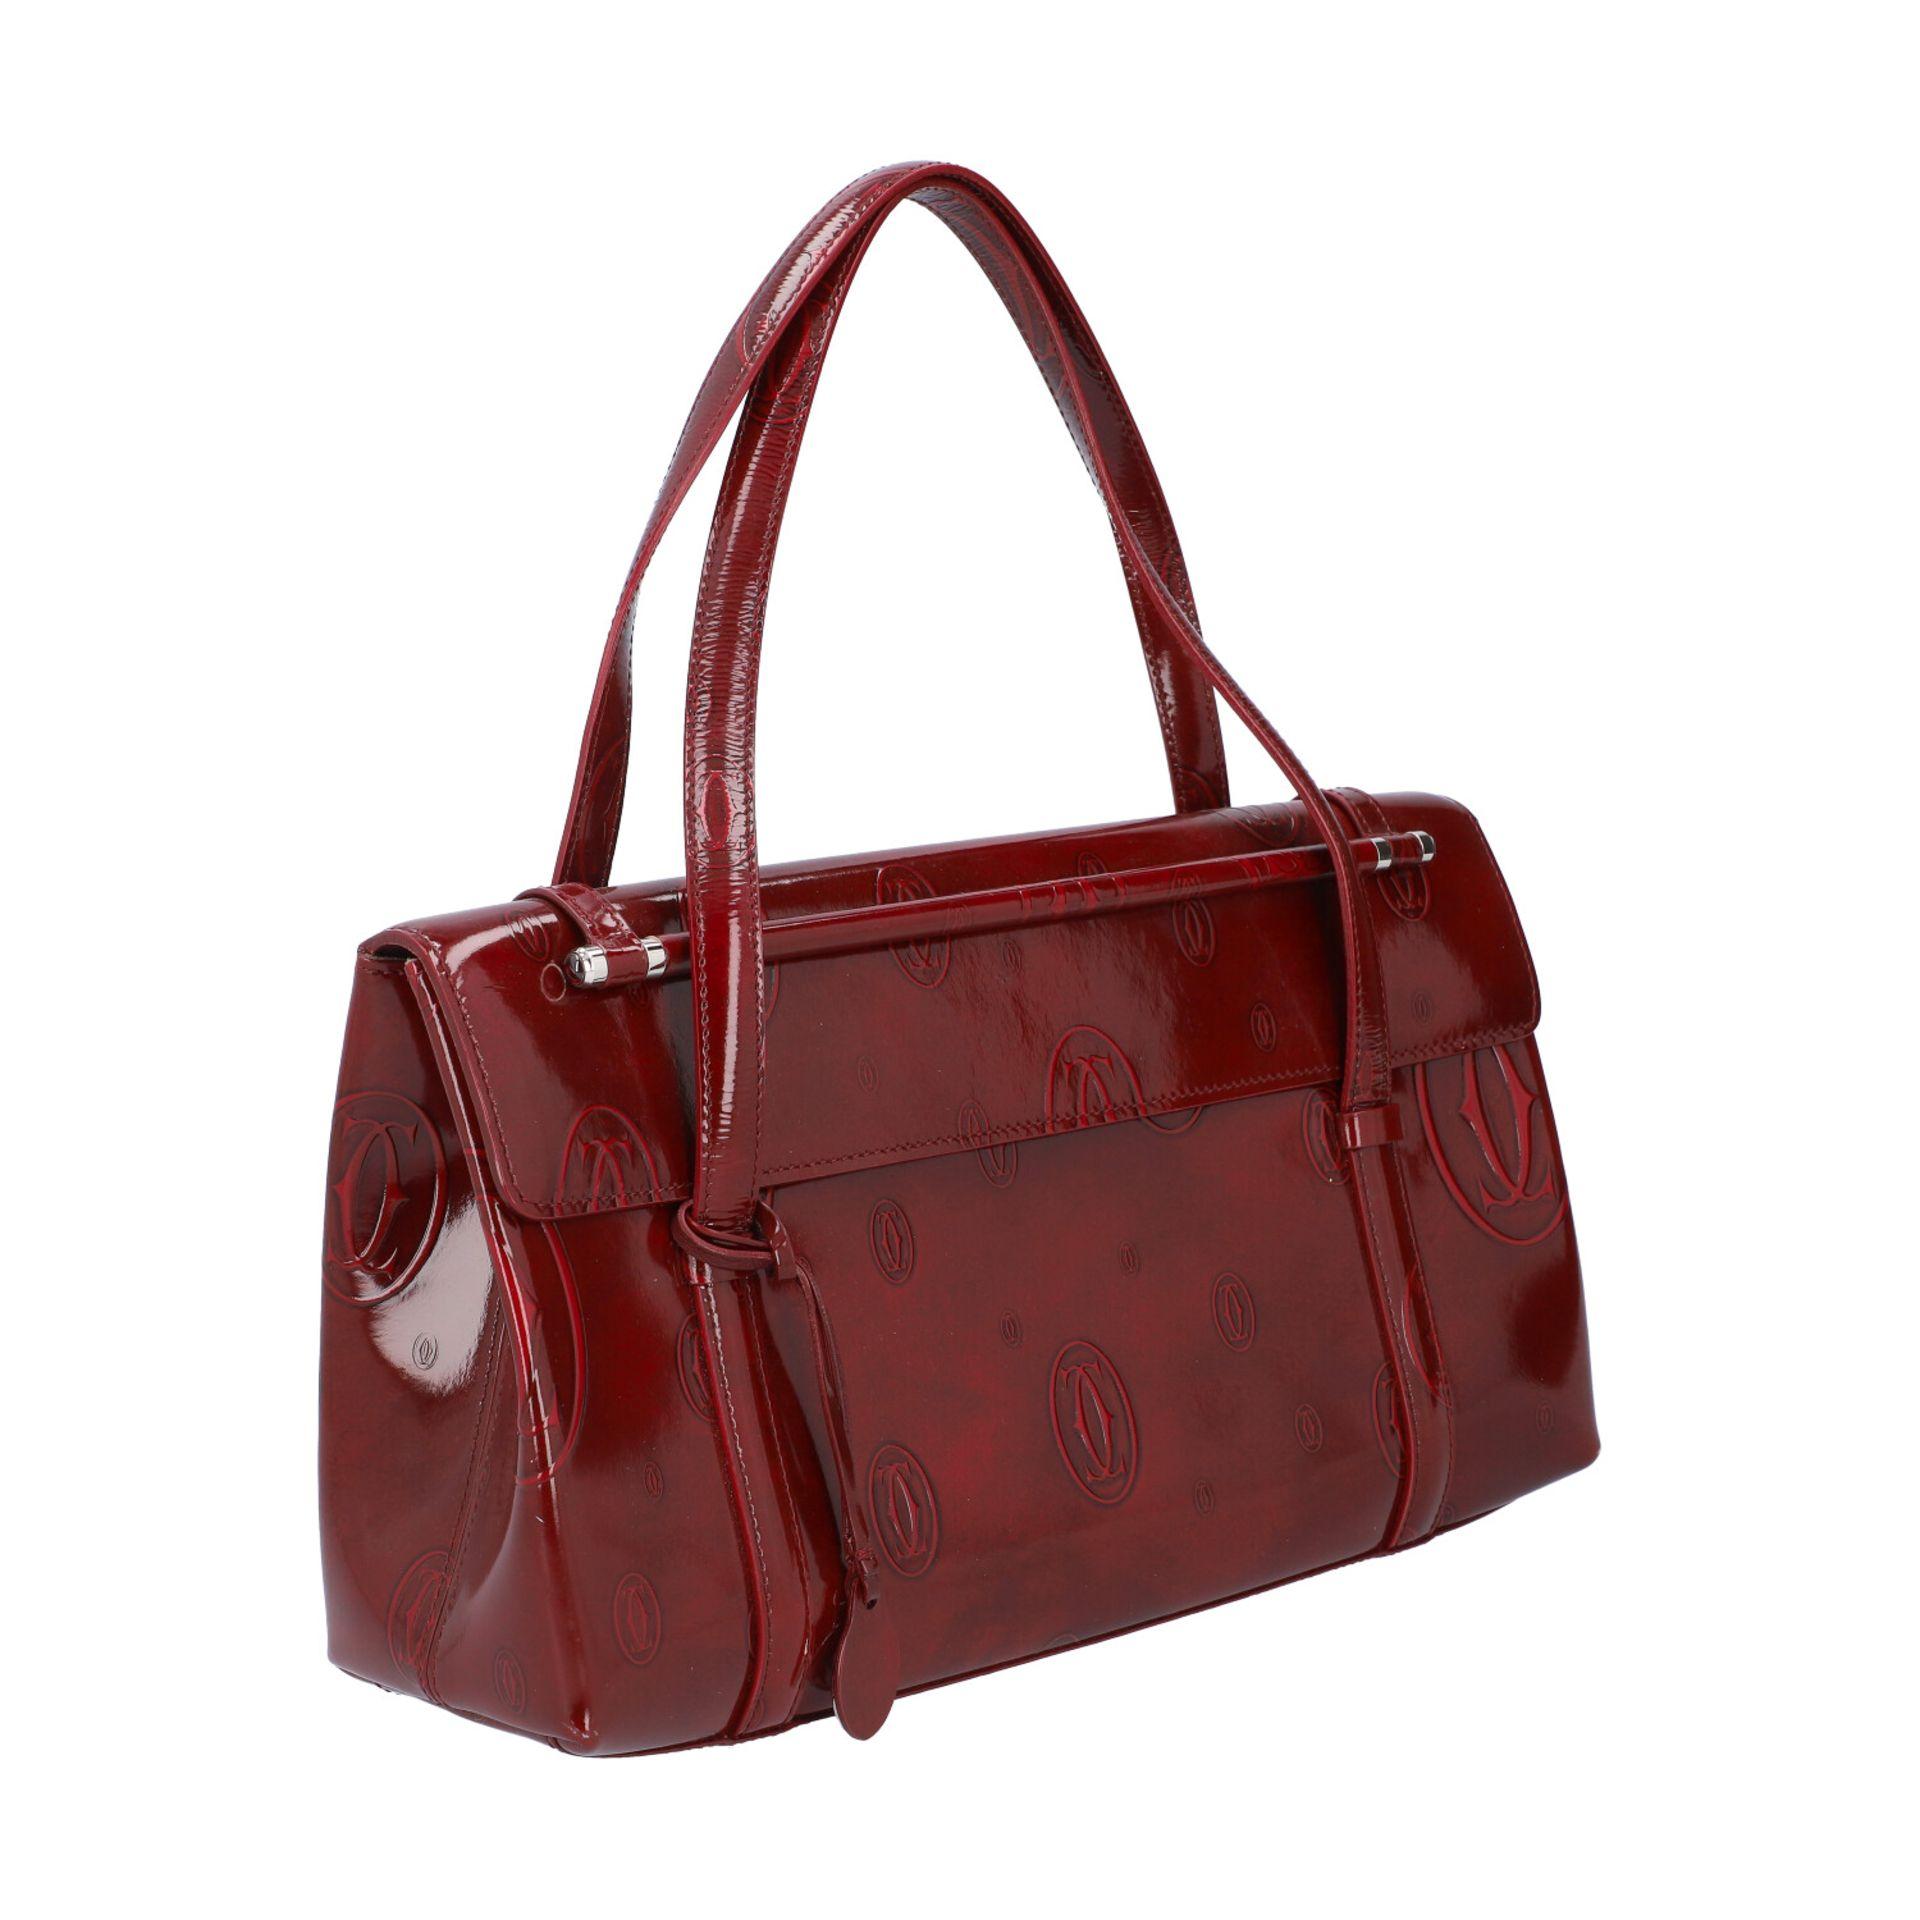 "CARTIER VINTAGE Handtasche ""HAPPY BIRTHDAY"". - Image 2 of 8"